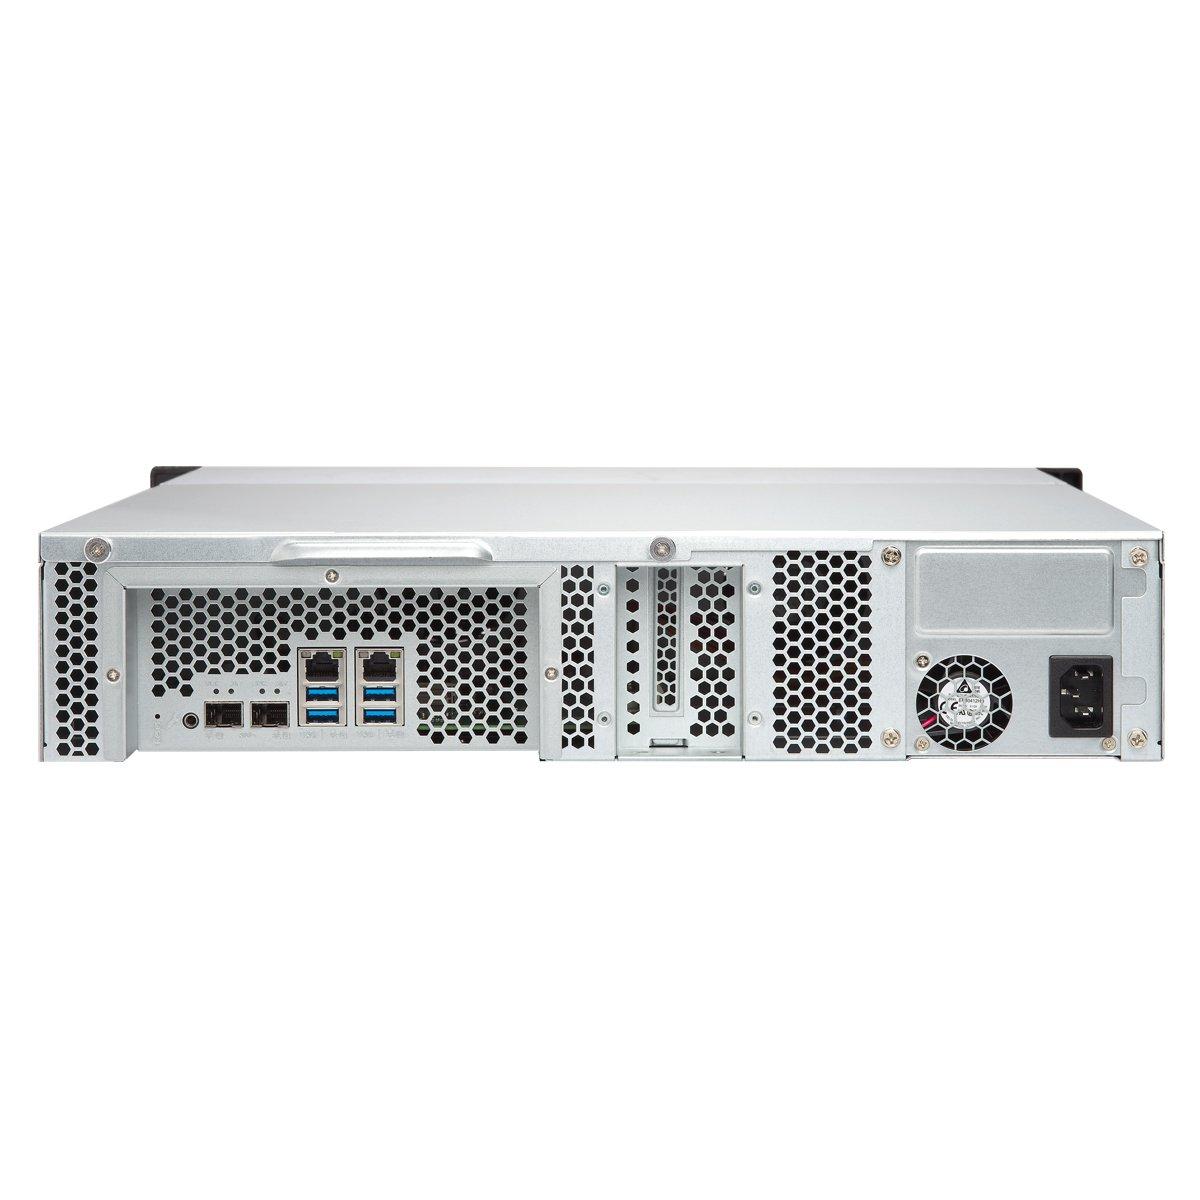 Qnap TS-1231XU-4G-US 12-Bay ARM-based 10G NAS, Quad Core 1.7GHz, 4GB DDR3 RAM, 2 x 10GbE SFP+, 2 x GbE, Single Power Supply by QNAP (Image #4)